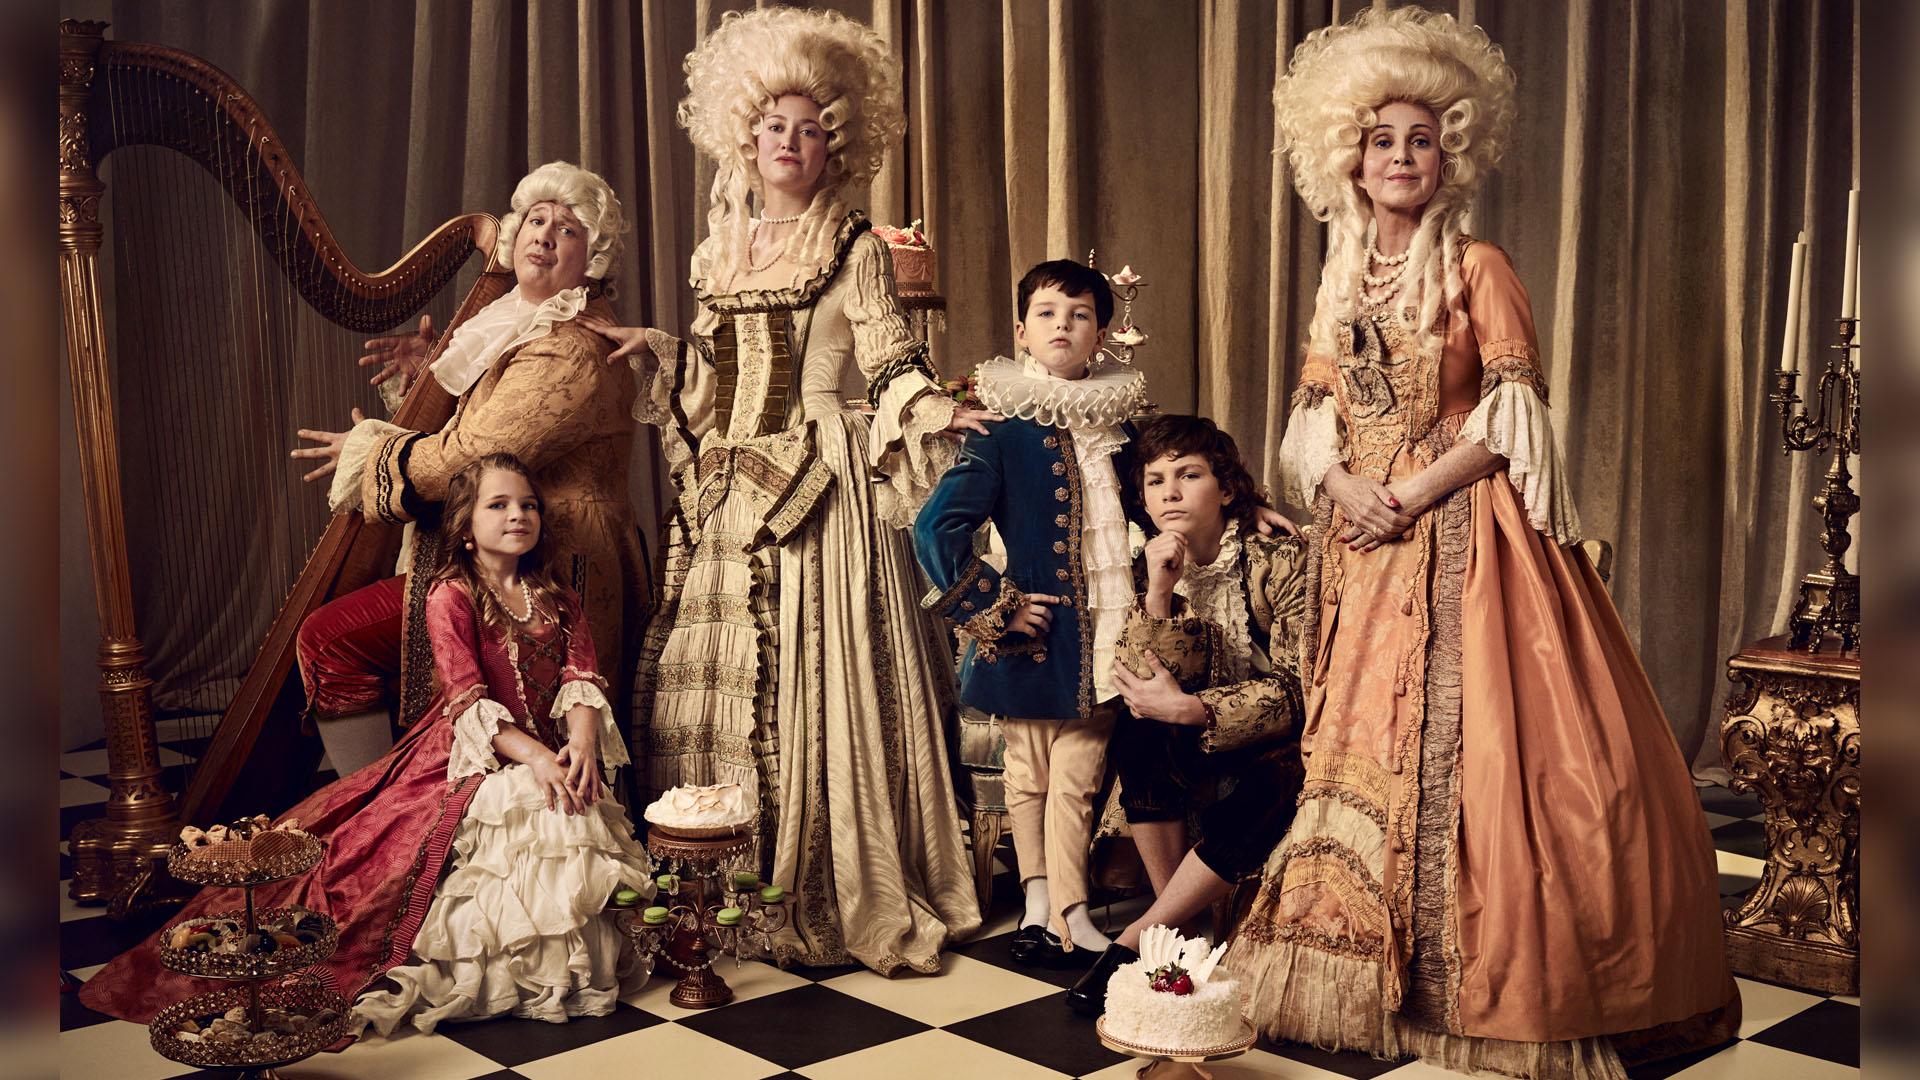 Young Sheldon stars as a Renaissance family